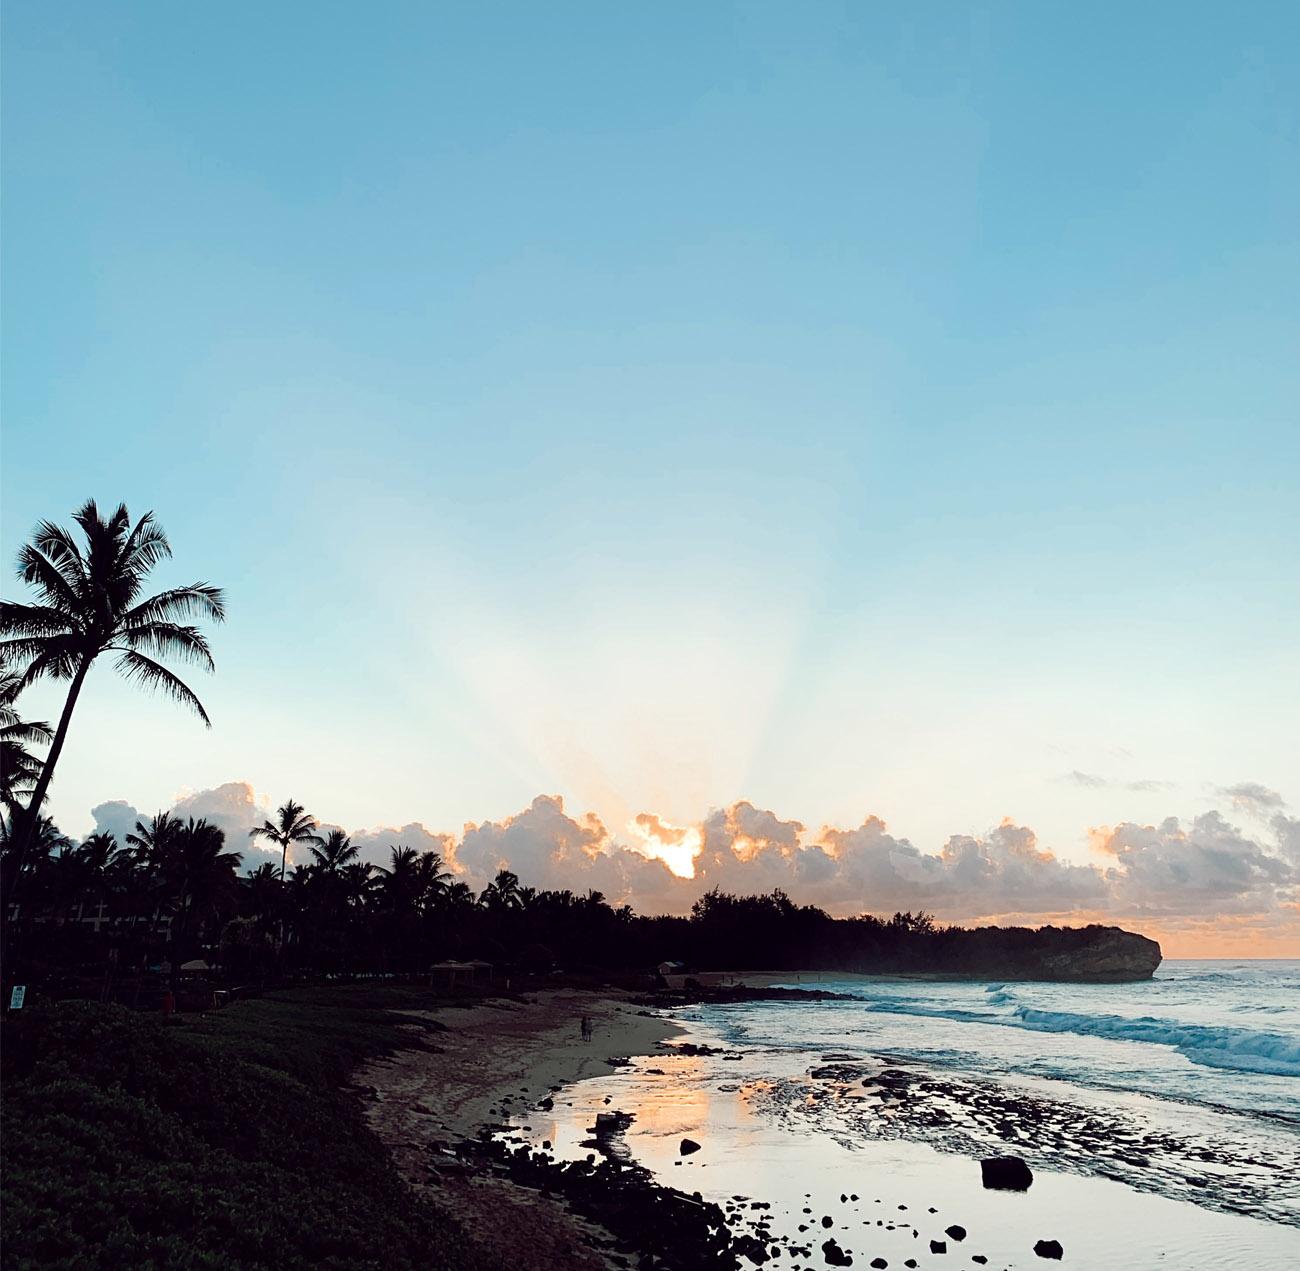 Sunrise in Kauai at the Grand Hyatt Resort & Spa in Kauai